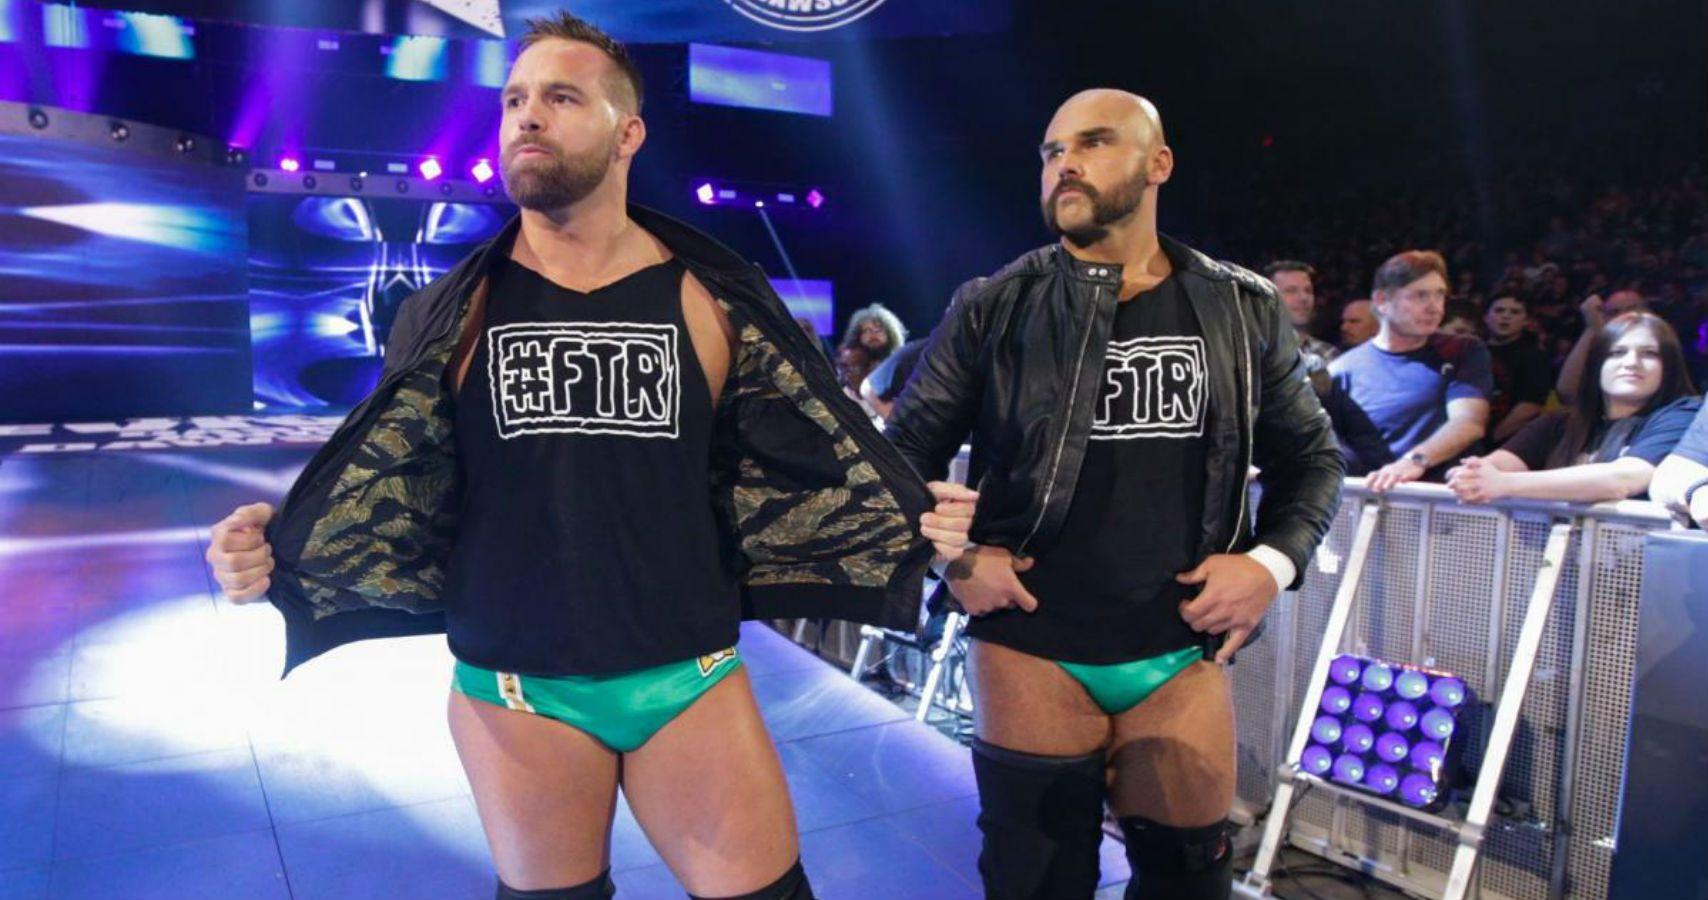 The Revivial, Scott Dawson, Dash Wilder, WWE, Raw, Tag Team, Raw Tag Team champions